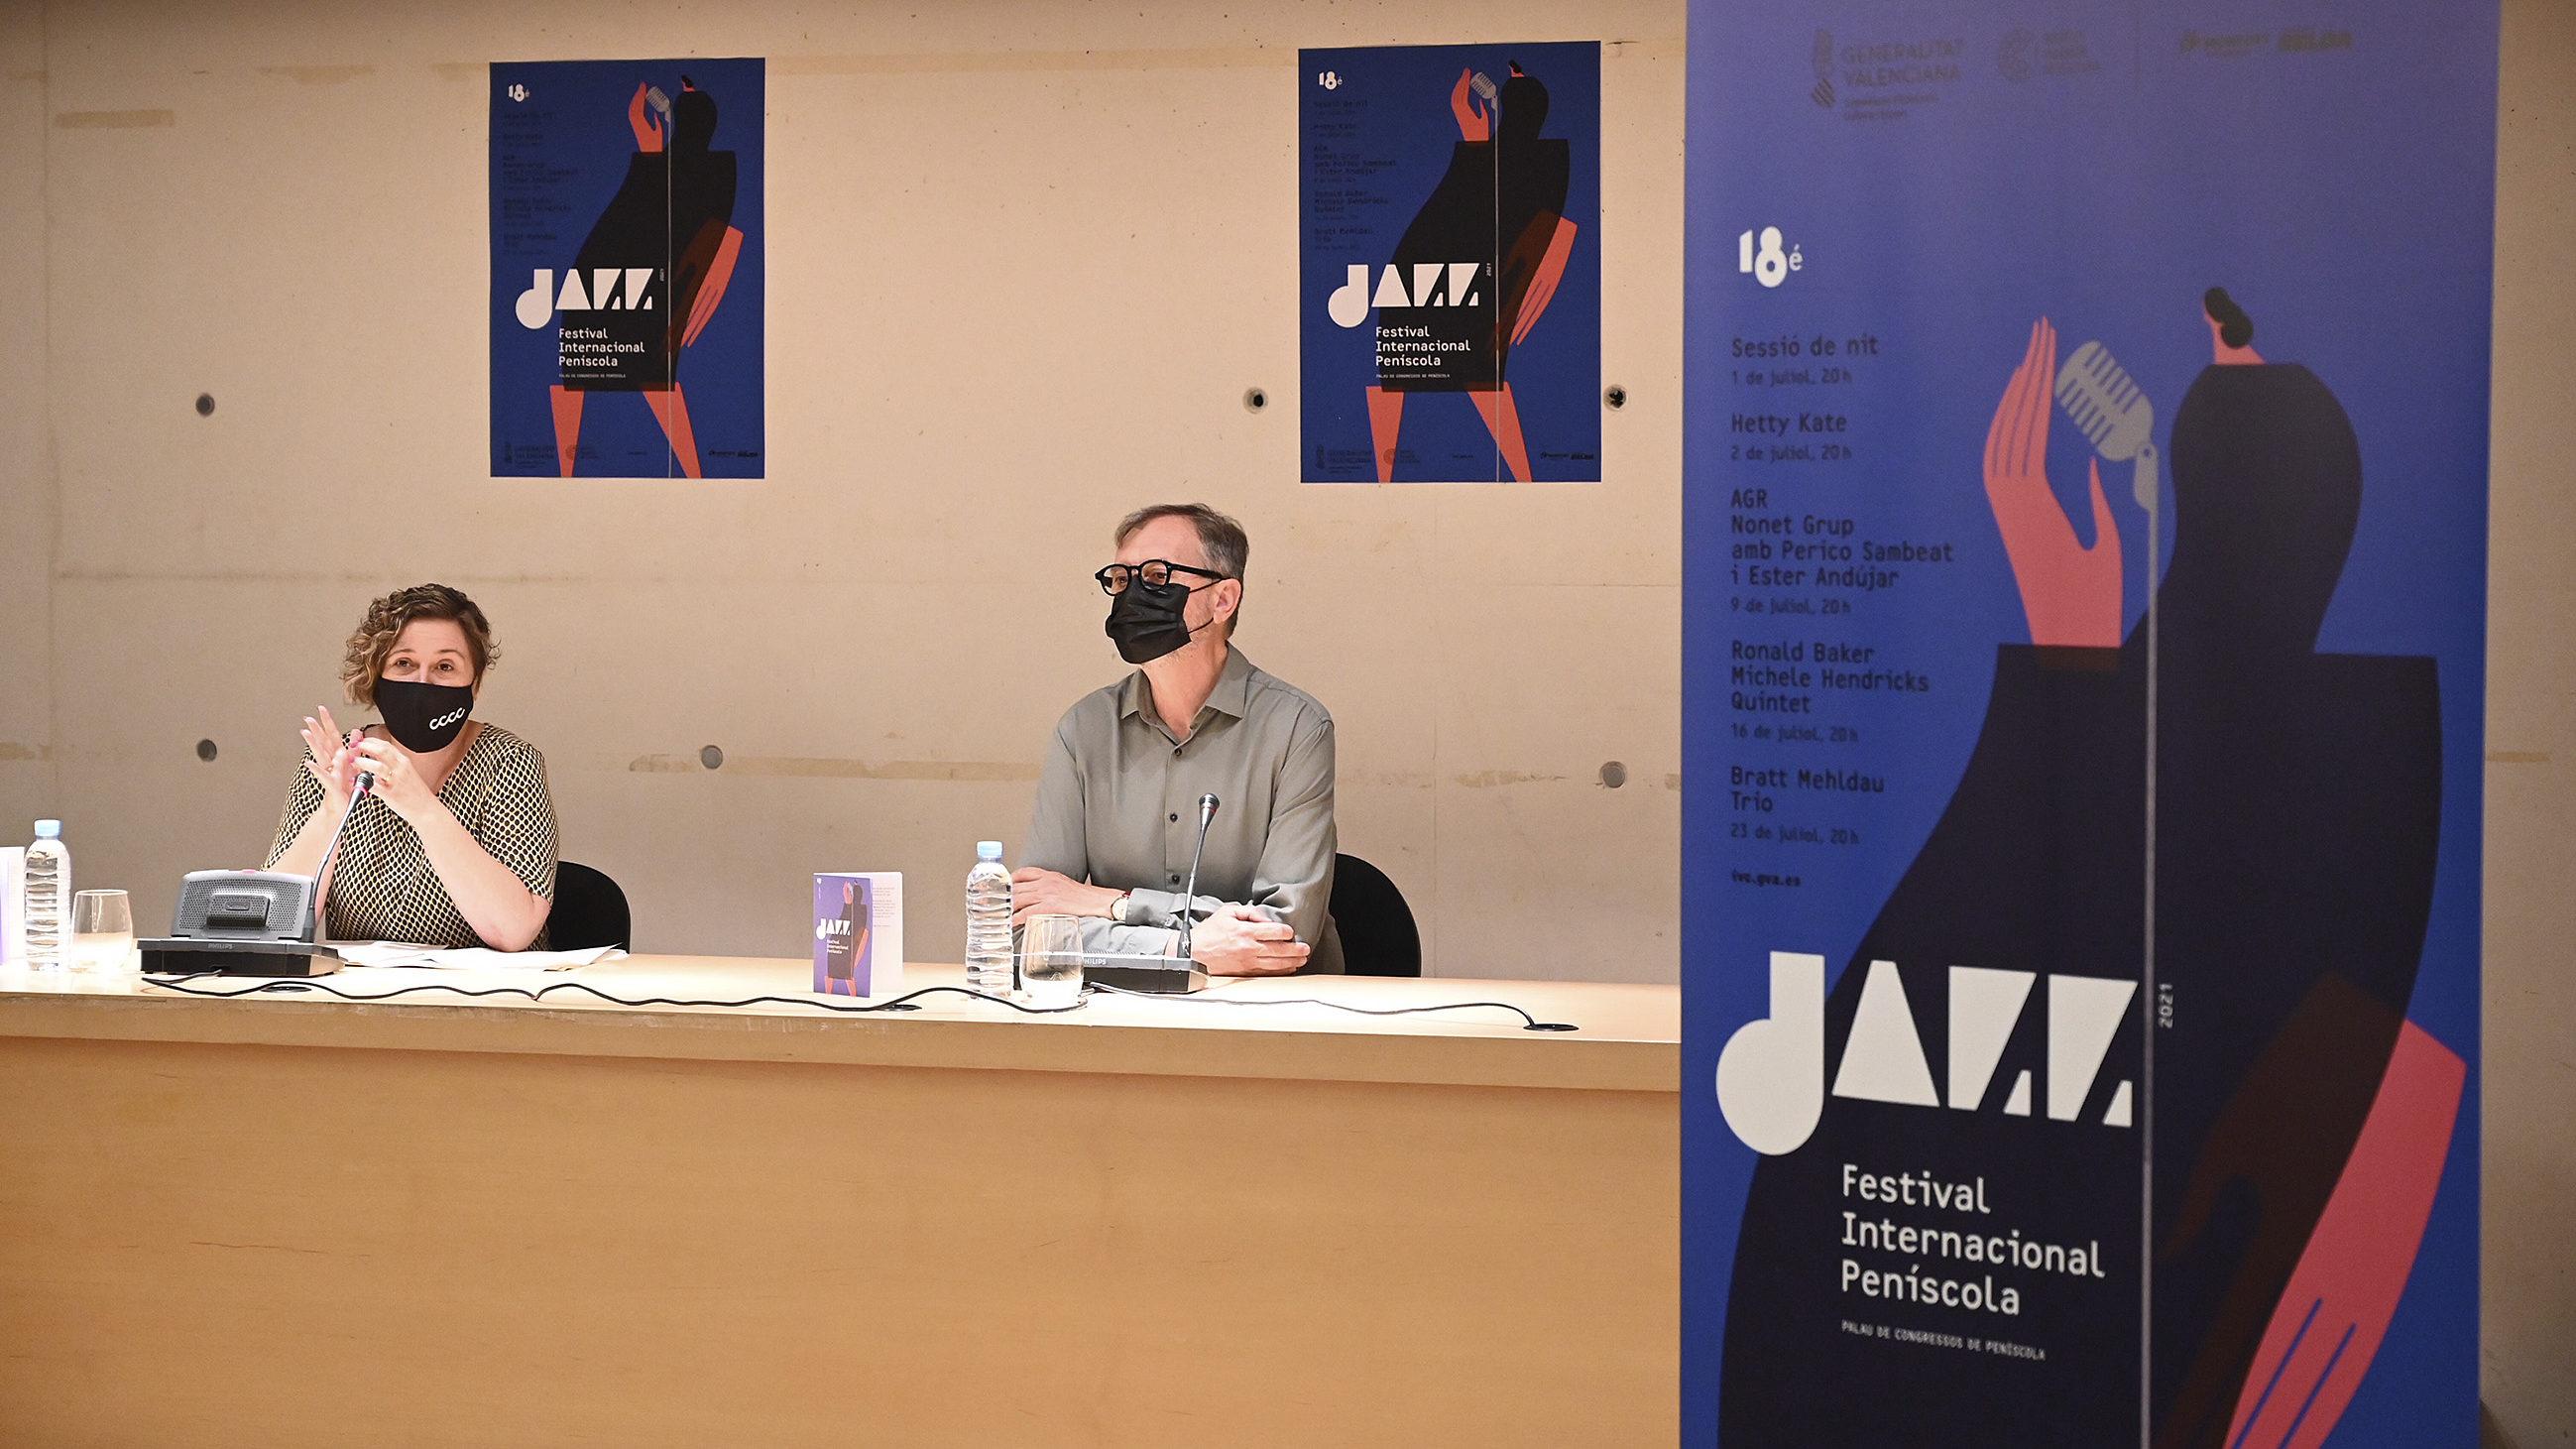 El pianistaBradMehldau, la carismàticaHettyKatei la diva MicheleHendriks al Festival de Jazz de Peníscola